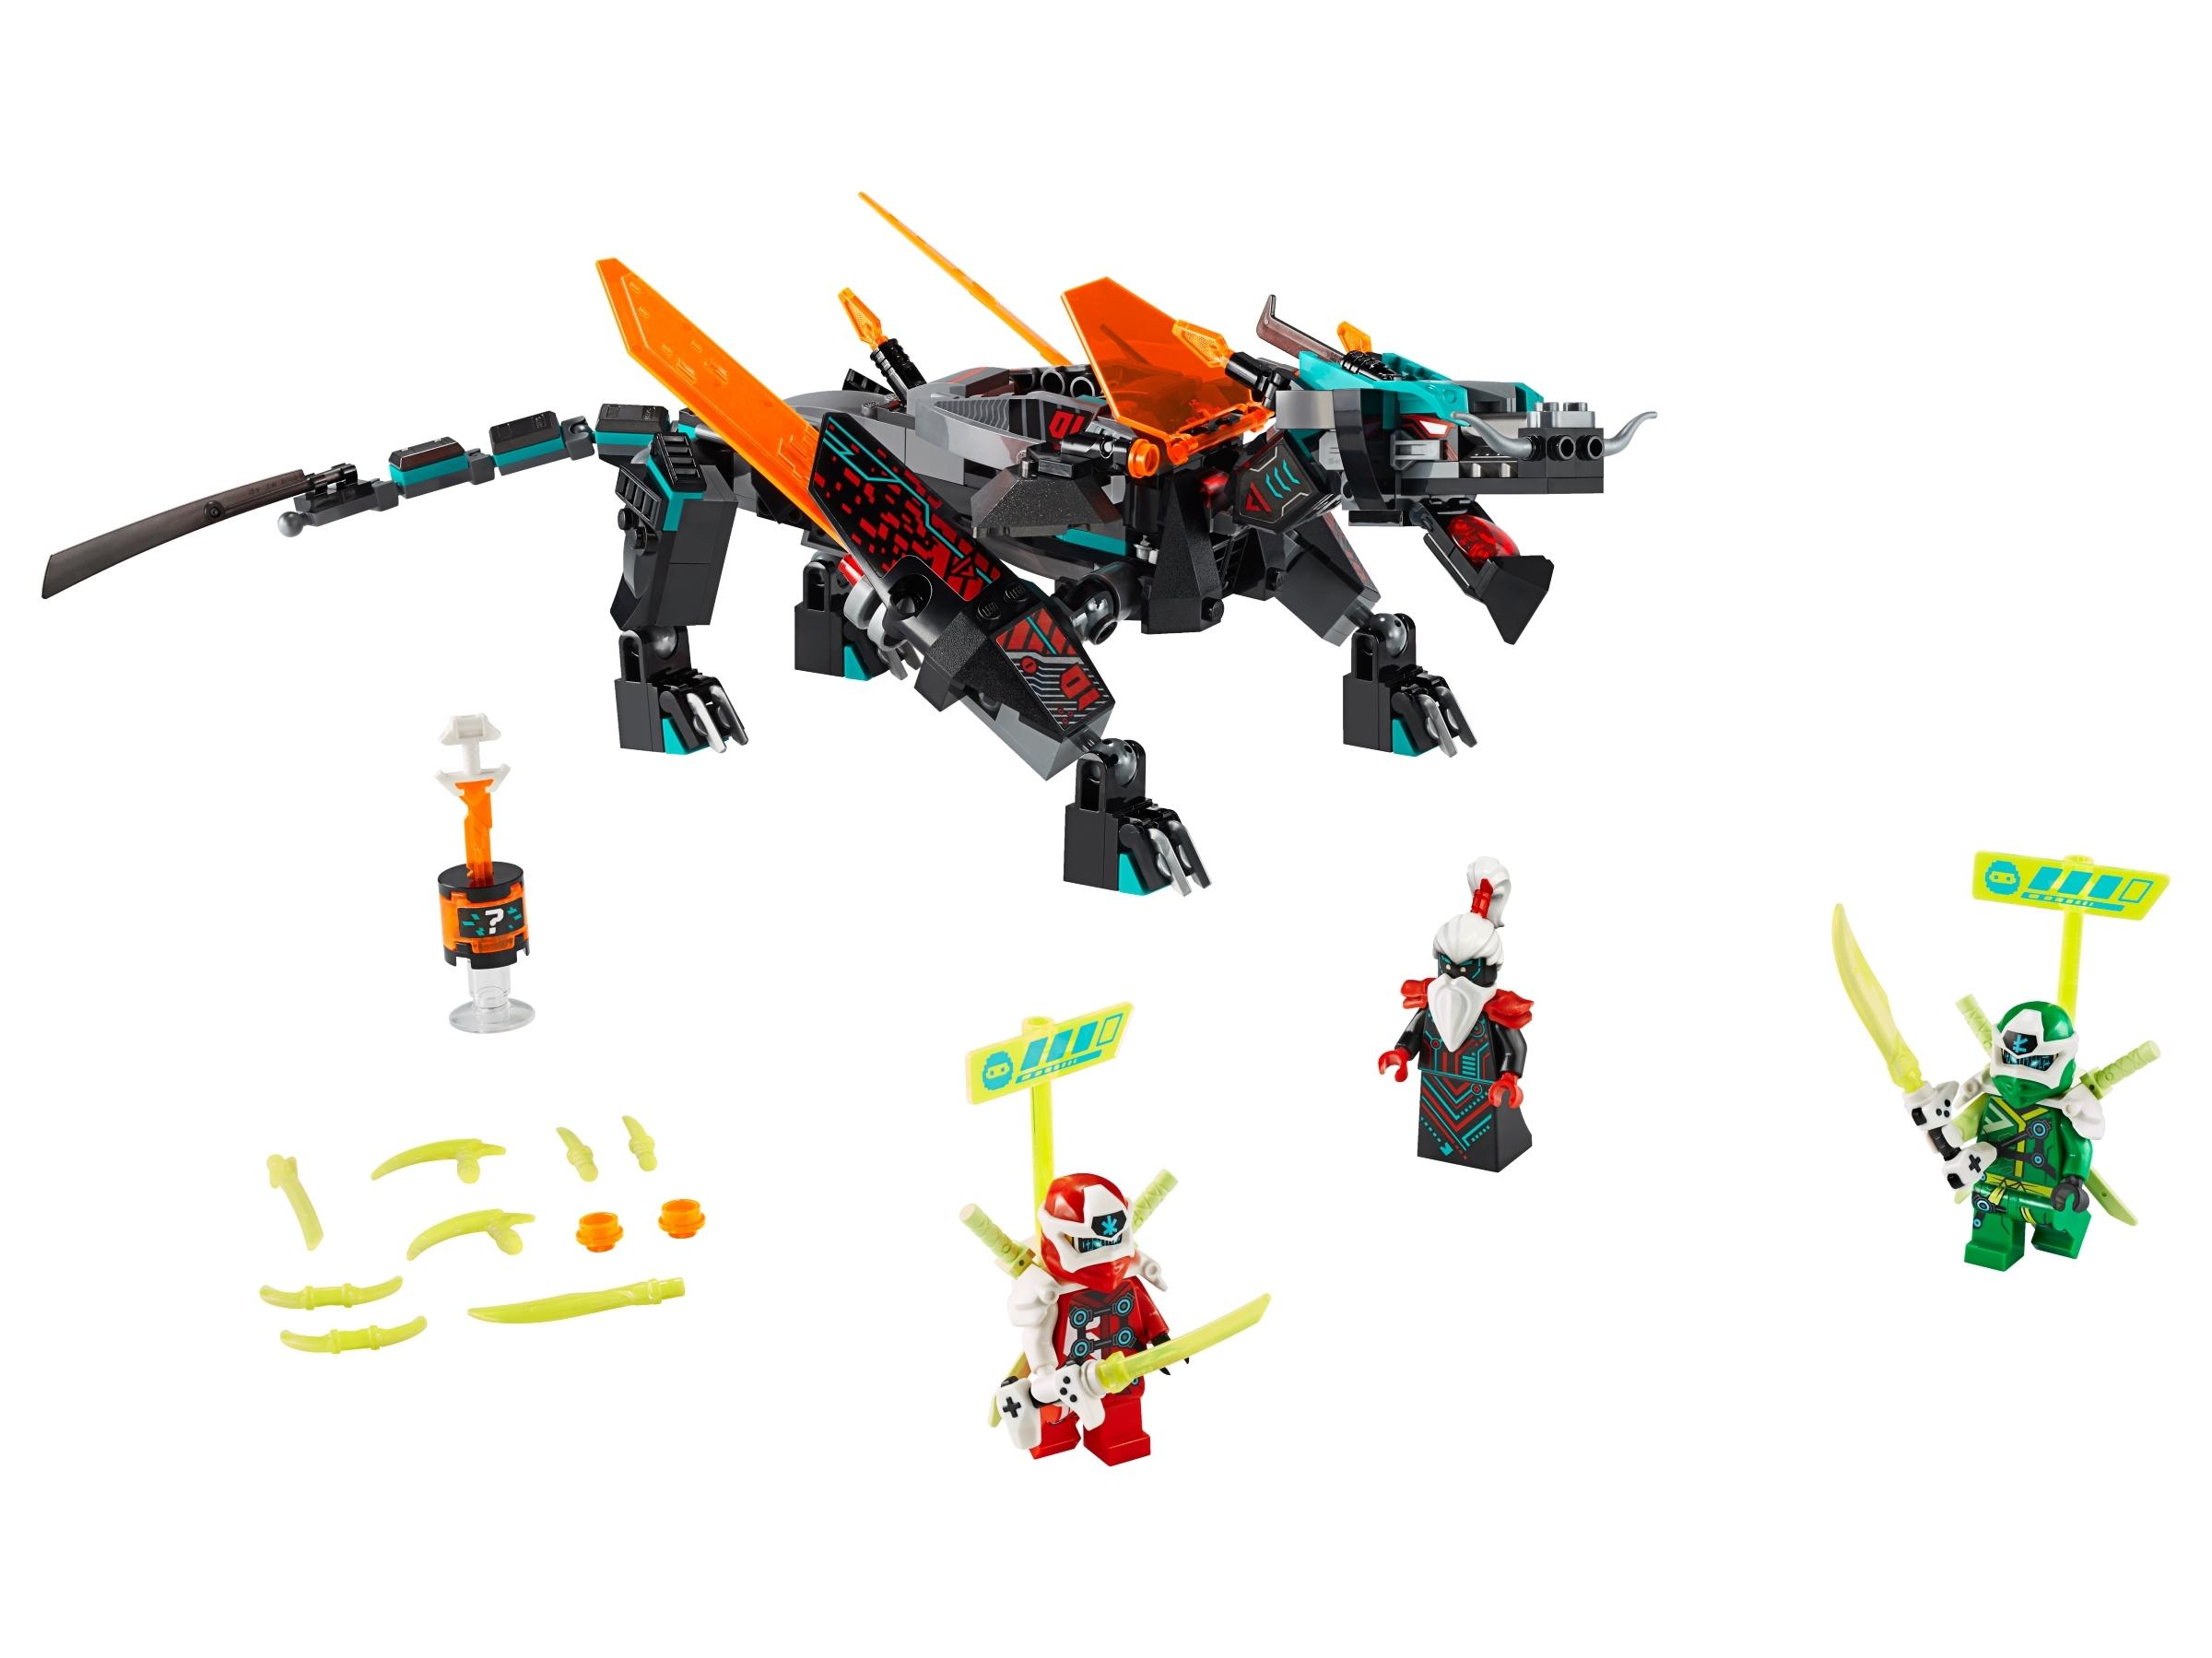 Threetush Ninjago Building Blocks Toys Minifigures with Accessories for Kids Set 12 Pcs Party supplie Dragon spinjitzu Spinners Ninjago citys